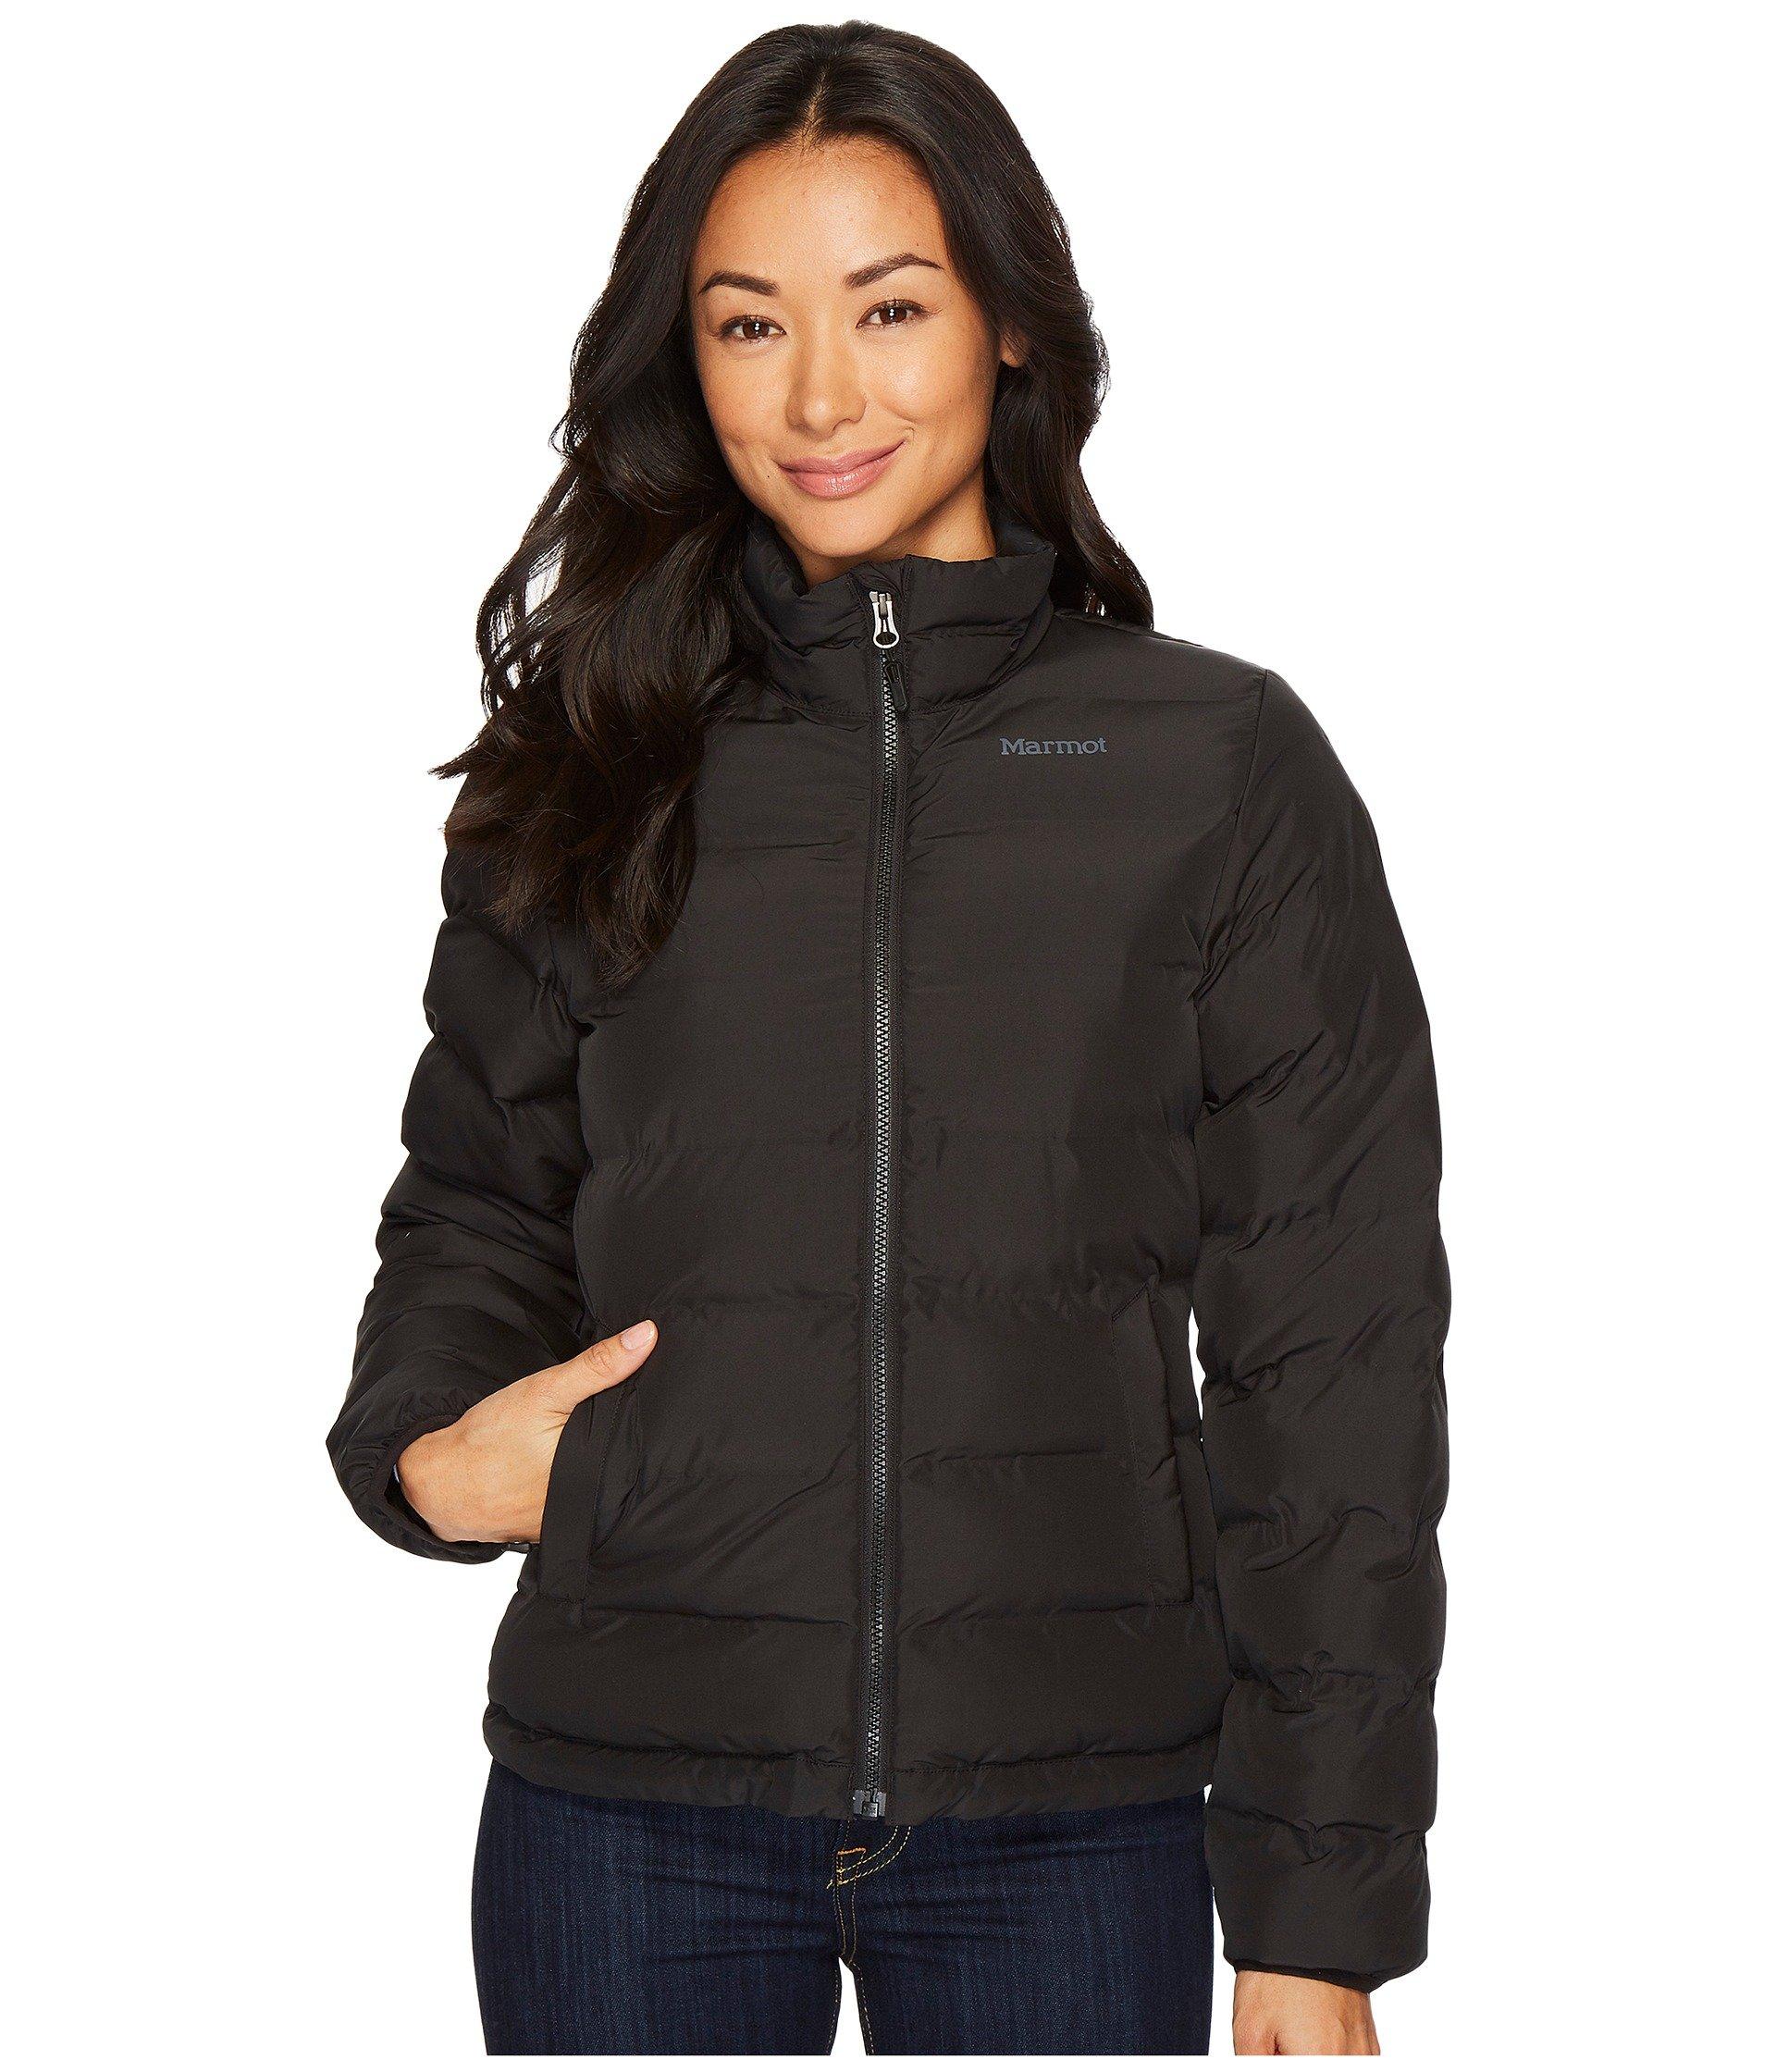 Marmot Alassian Featherless Jacket In Black  b3314a01bcb9